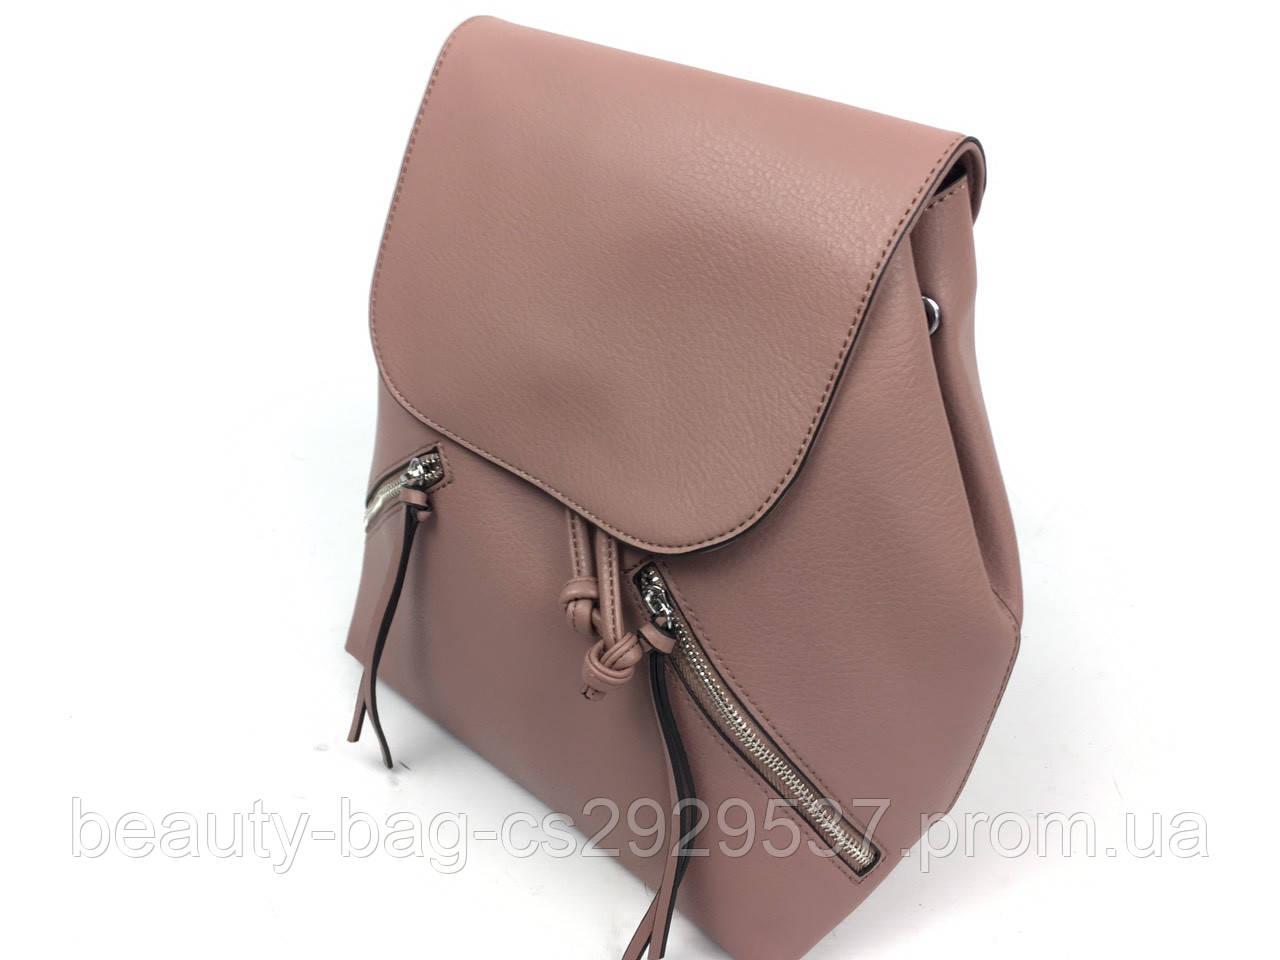 Рюкзак молодежный 3156 р-к Италия размер 27х30х15 см розовый